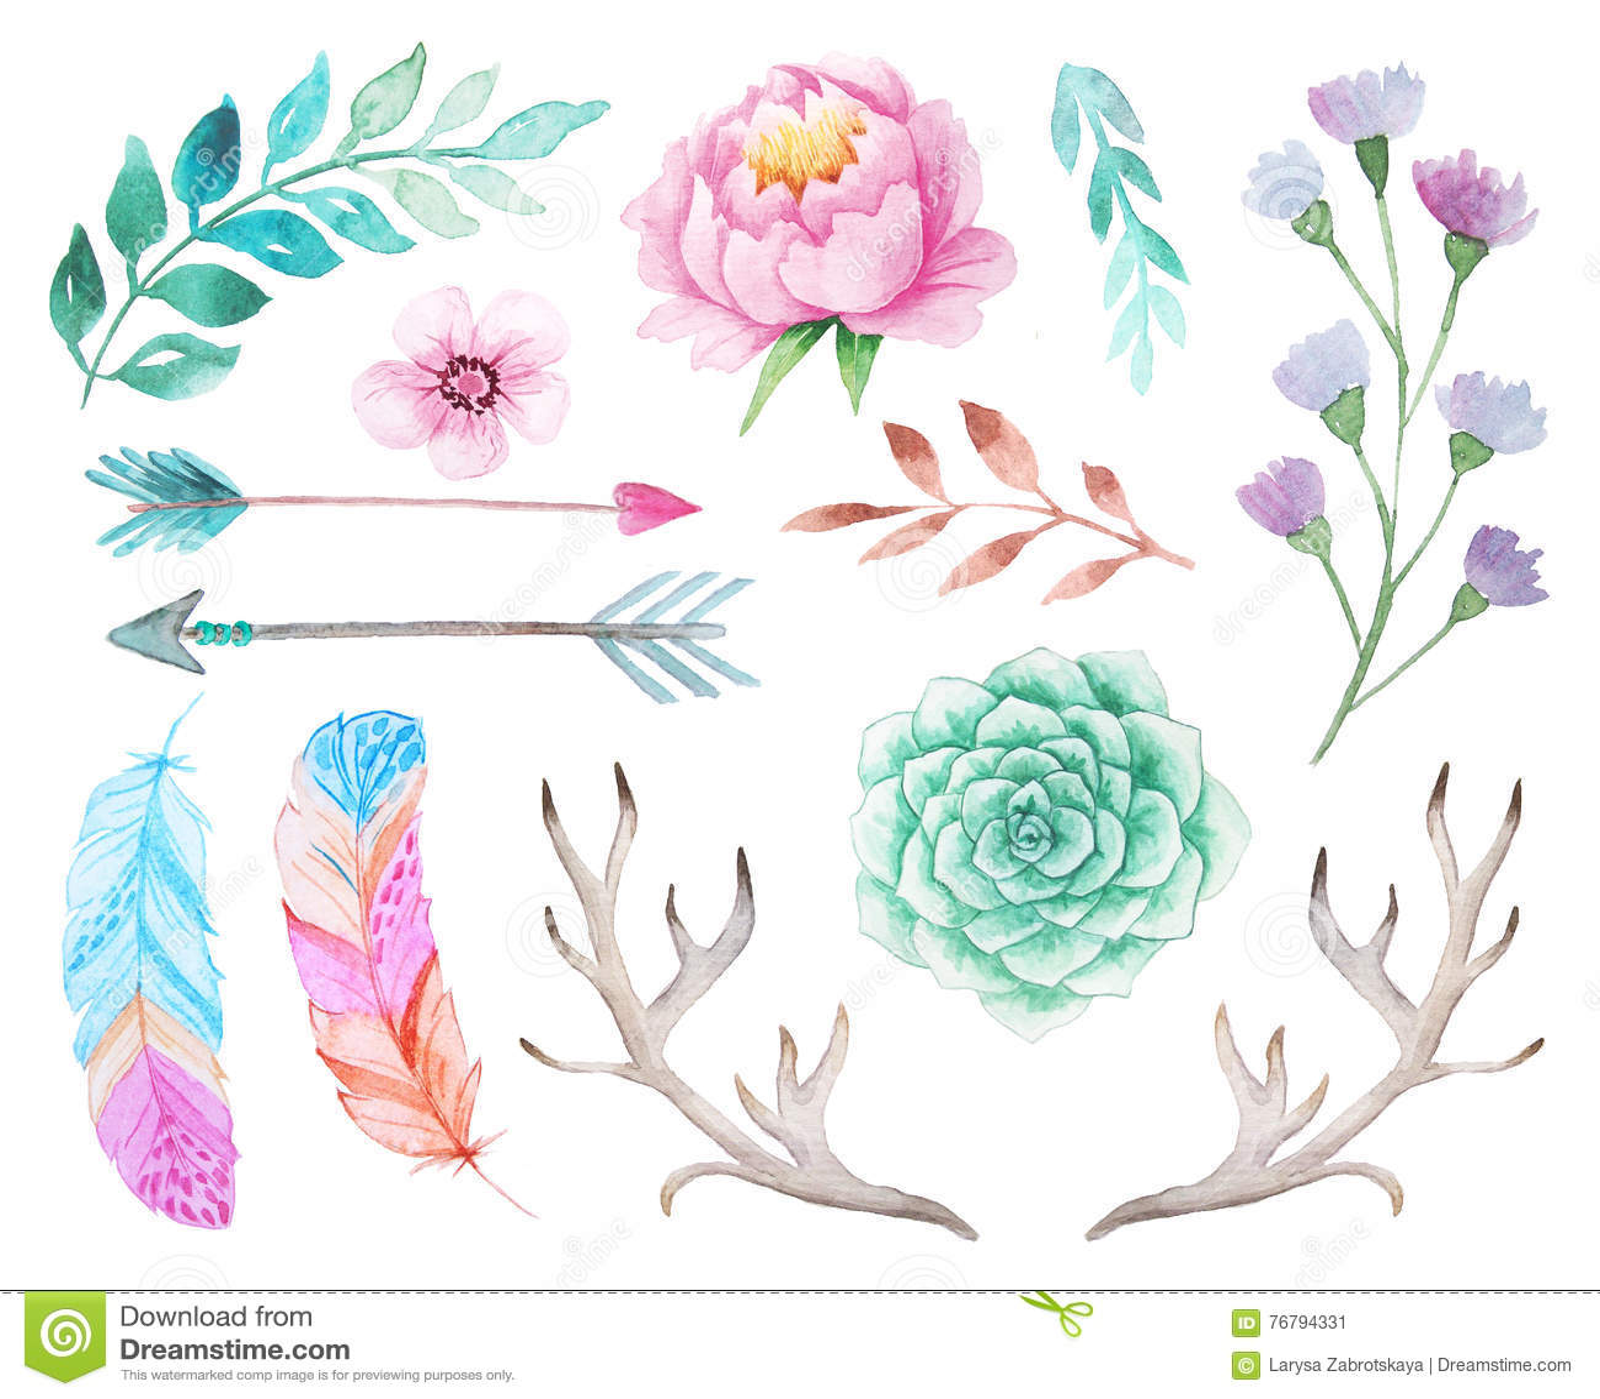 Dark Red Roses Flowers Watercolor Botanical Art Boho: Hand Painted Watercolor Flowers Clip Art Set. Royalty-Free